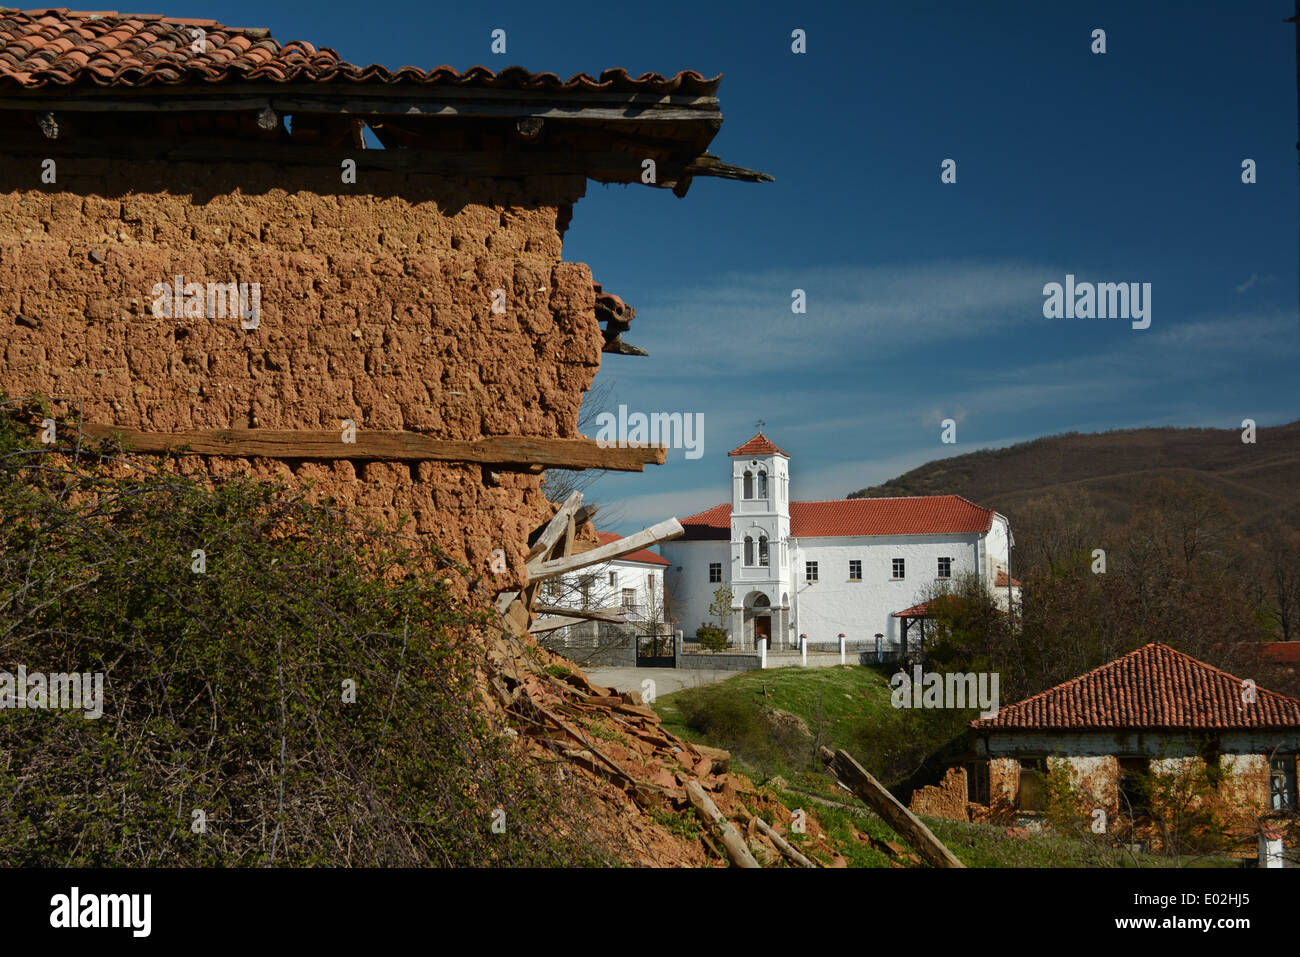 Church, Gavros, Greece - Stock Image